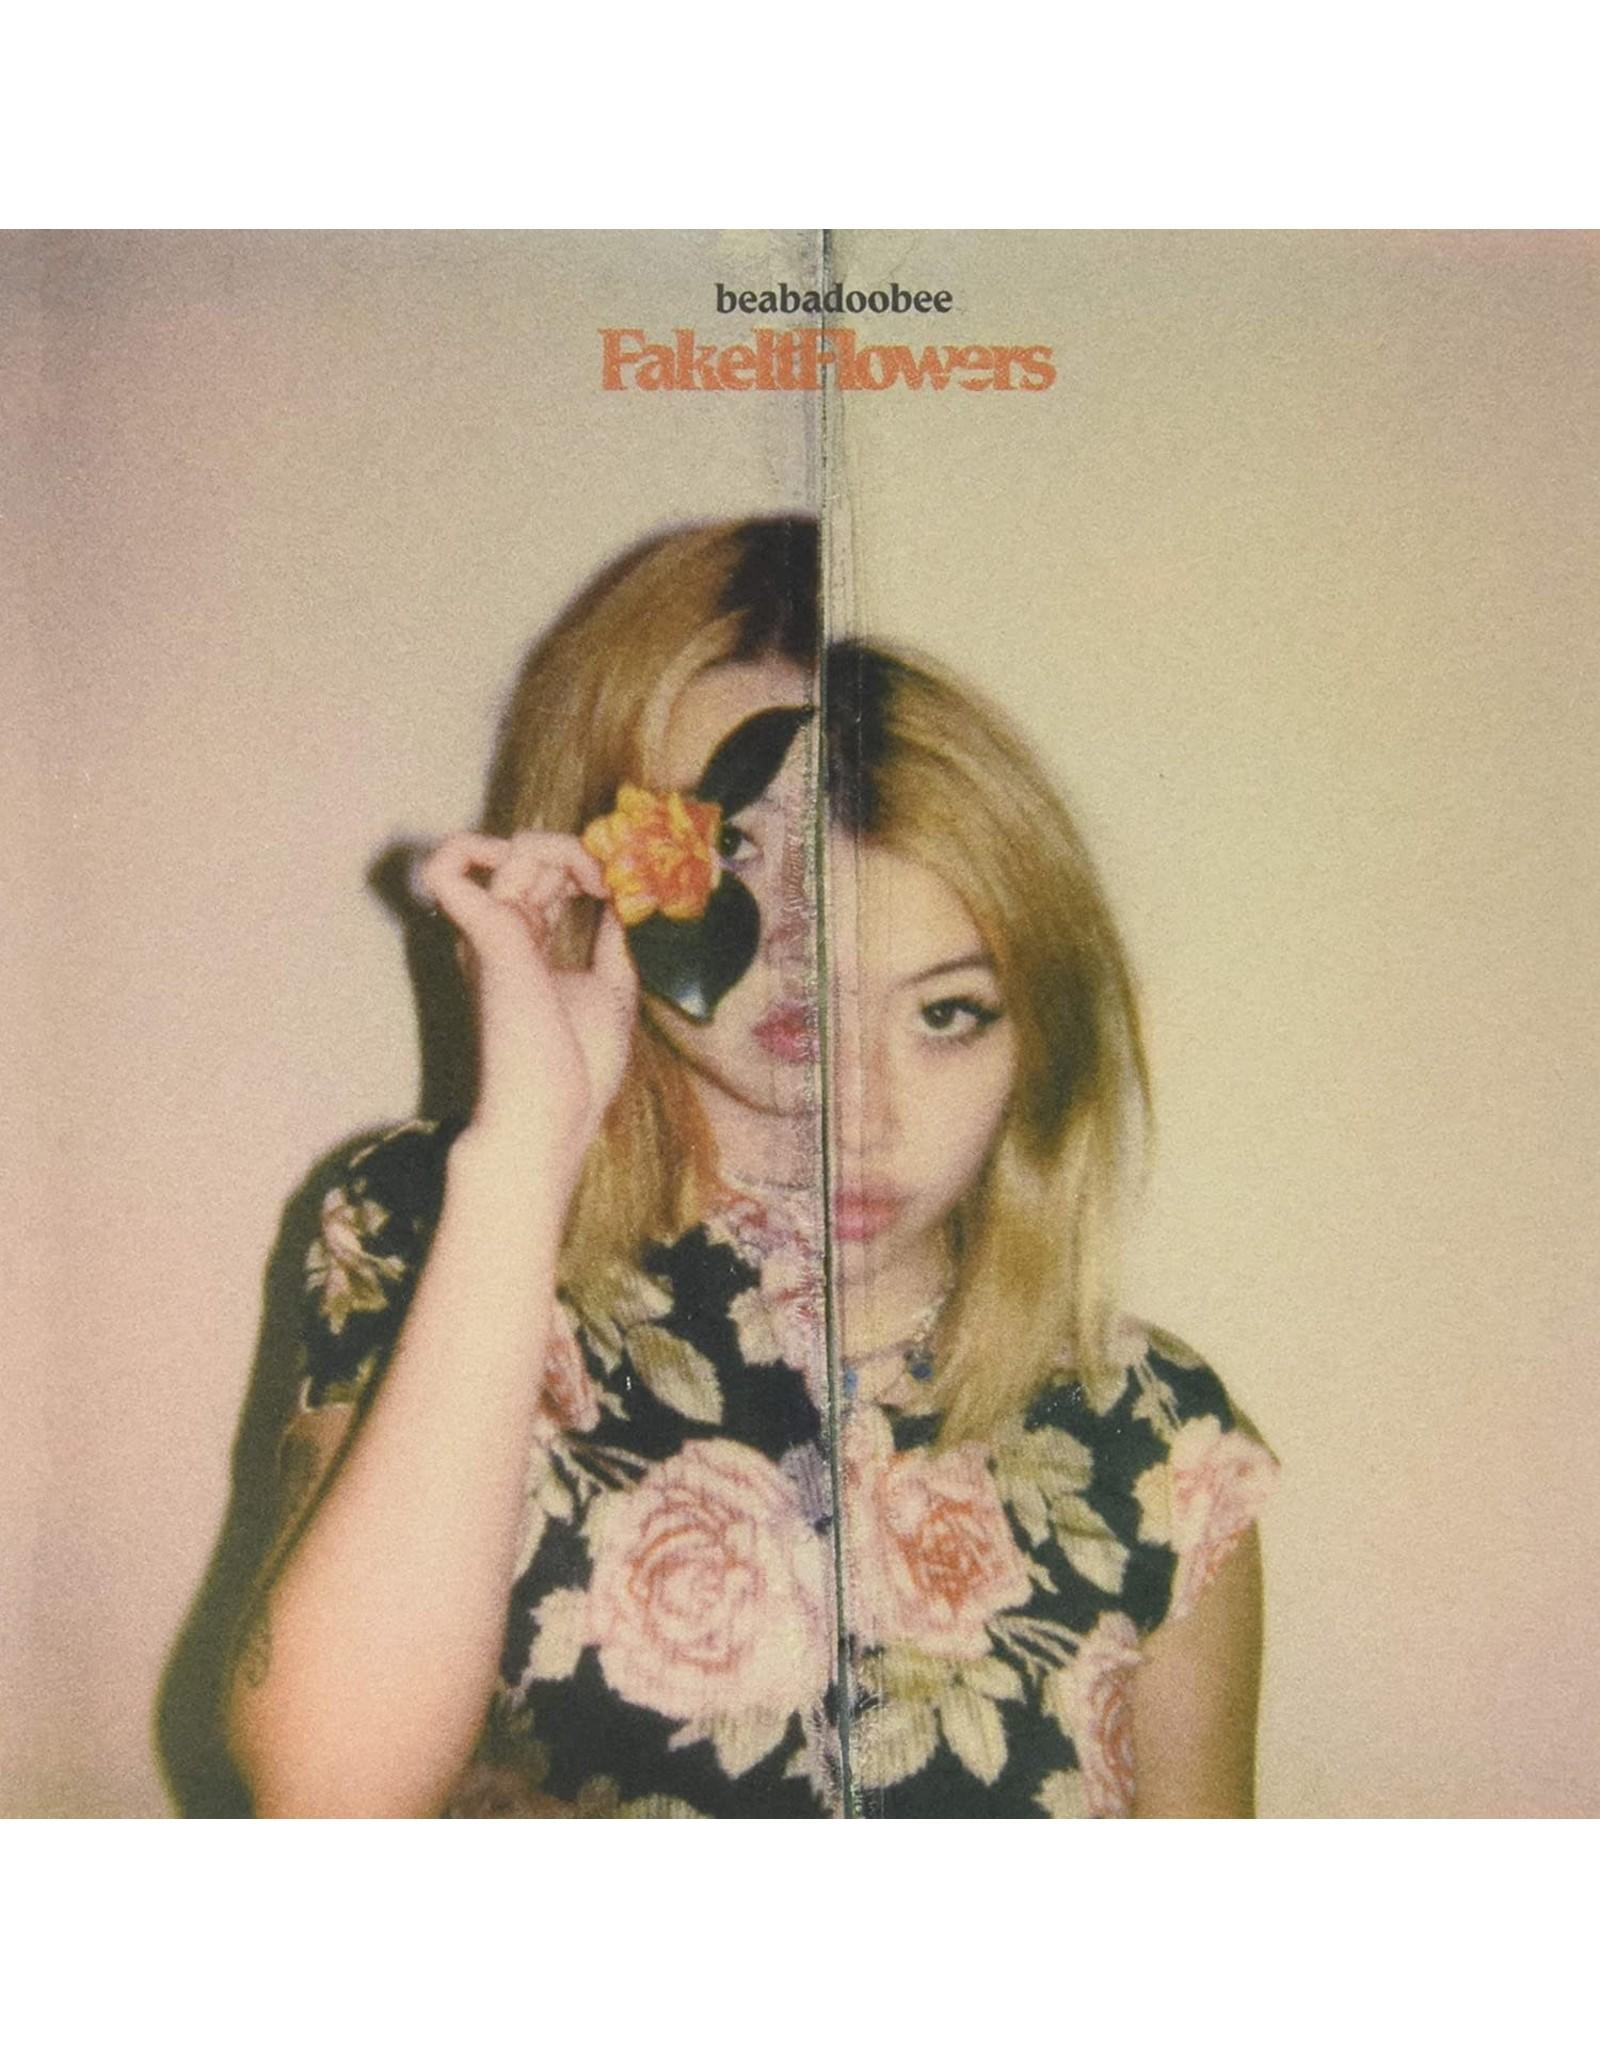 Beabadoobee - Fake It Flowers (Exclusive Red Vinyl)